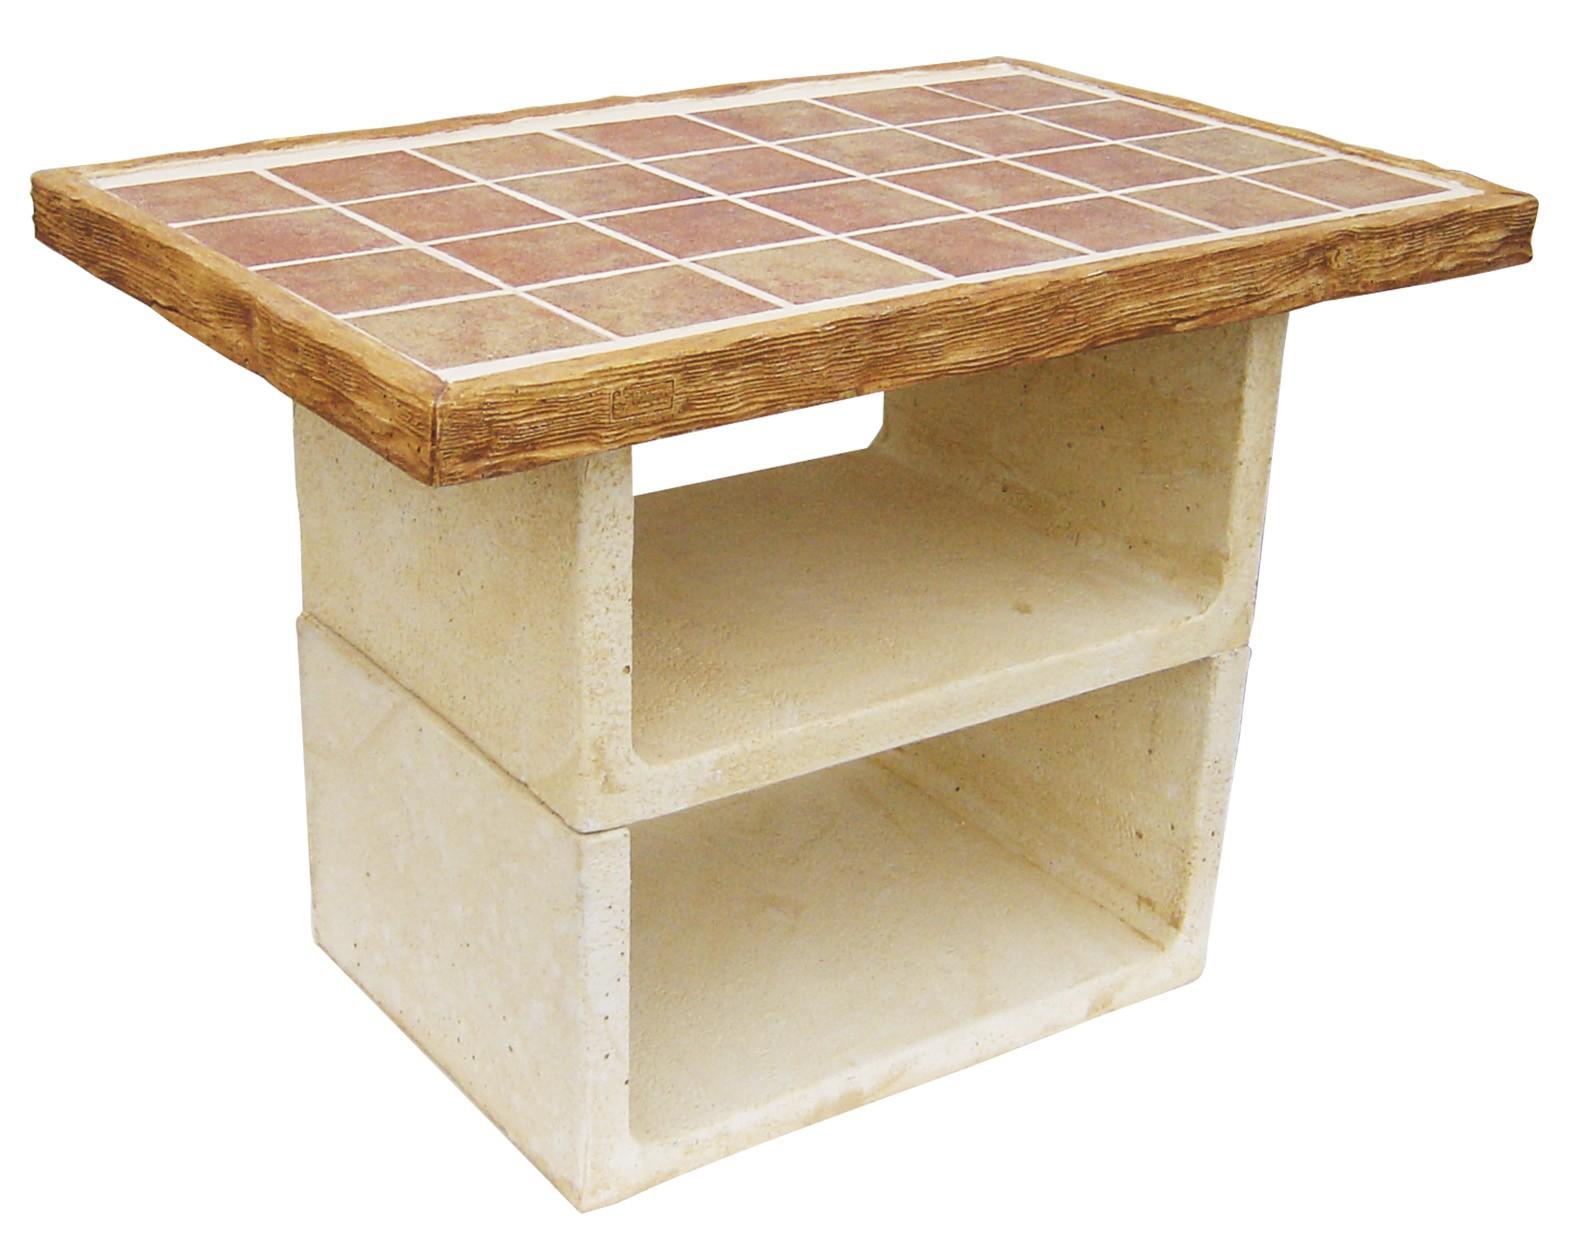 Mesa auxiliar para barbacoa barby modelo malibu de piedra for Barbacoa piedra volcanica jardin